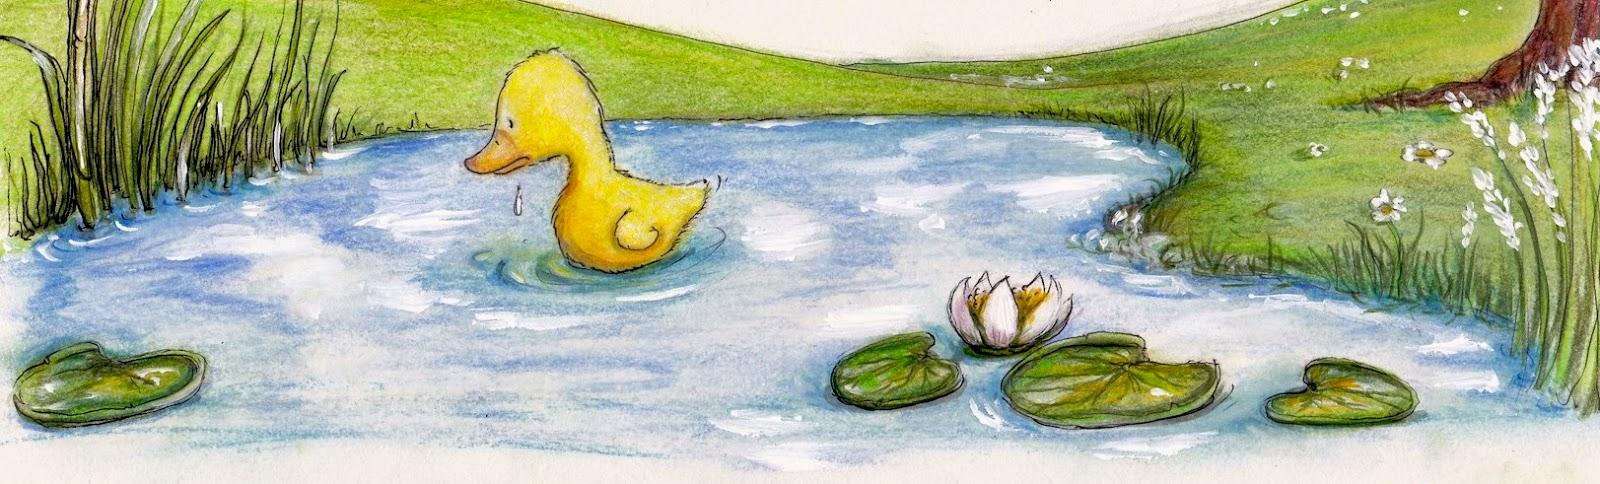 Kinderbuchillustration, Tiere, Küken